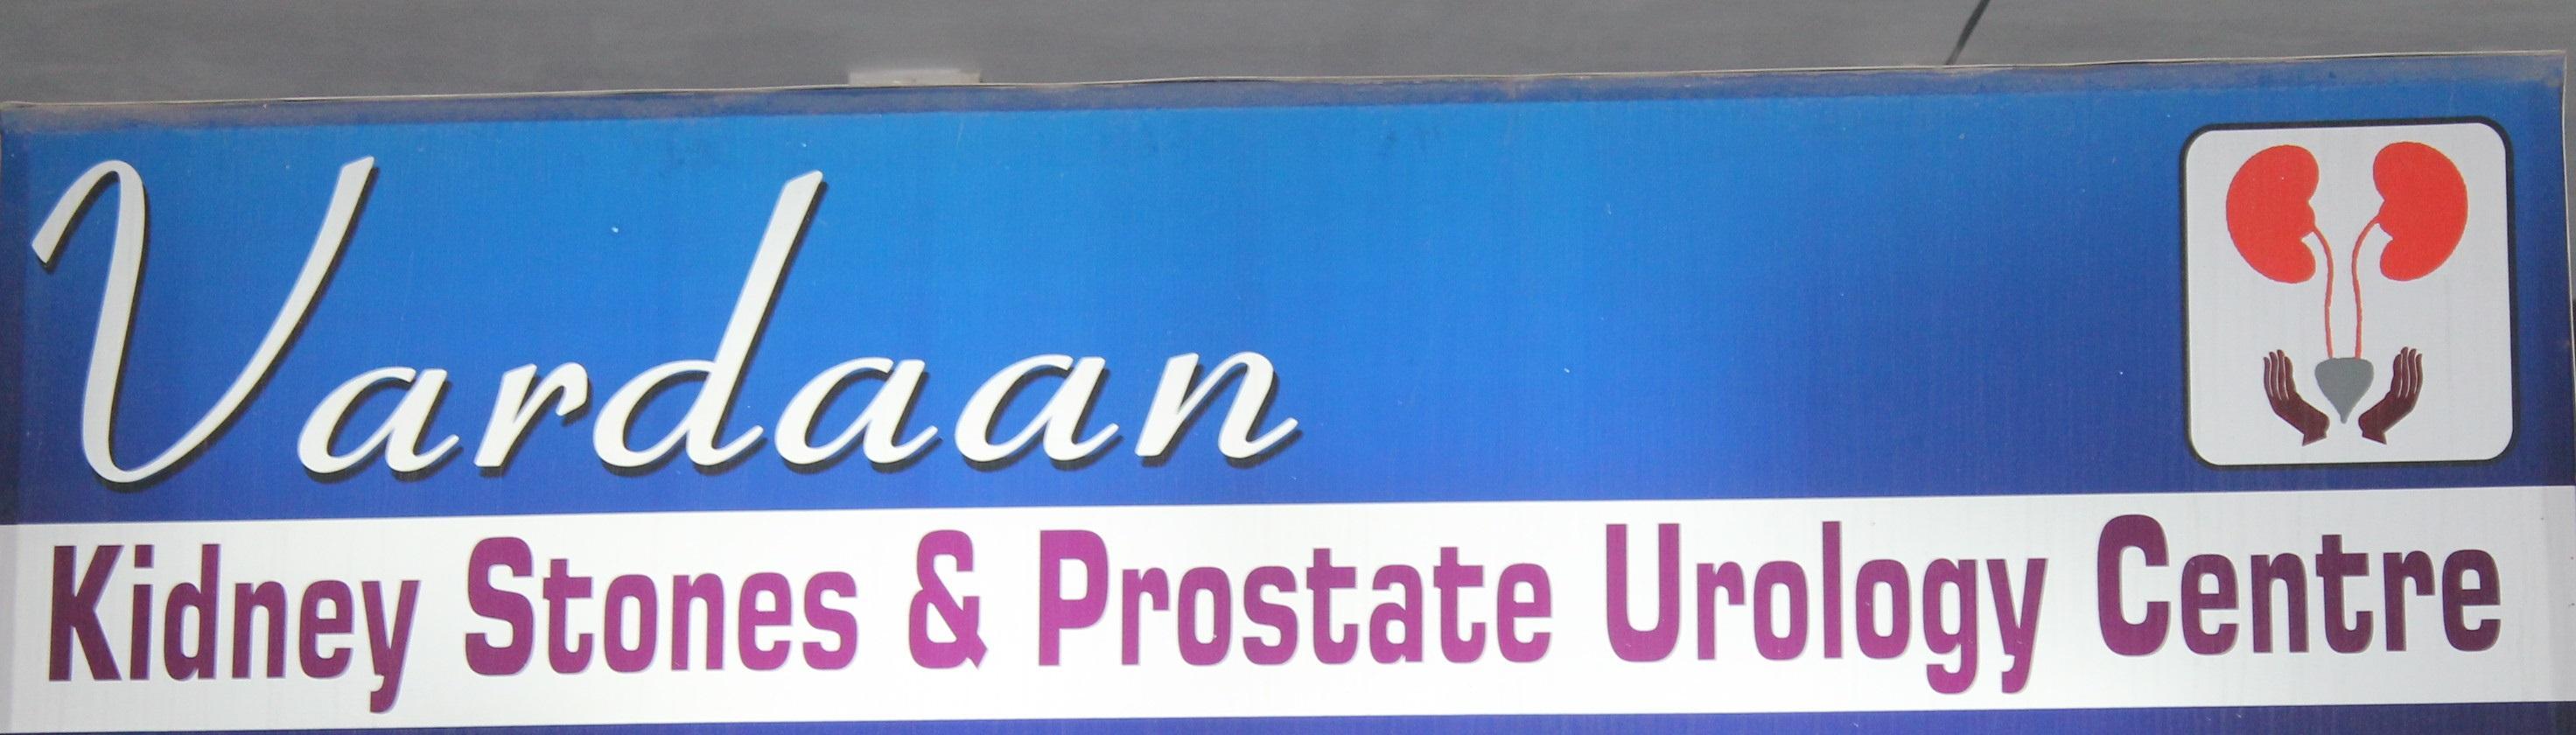 Vardaan - Kidney Stones & Prostate Urology Centre